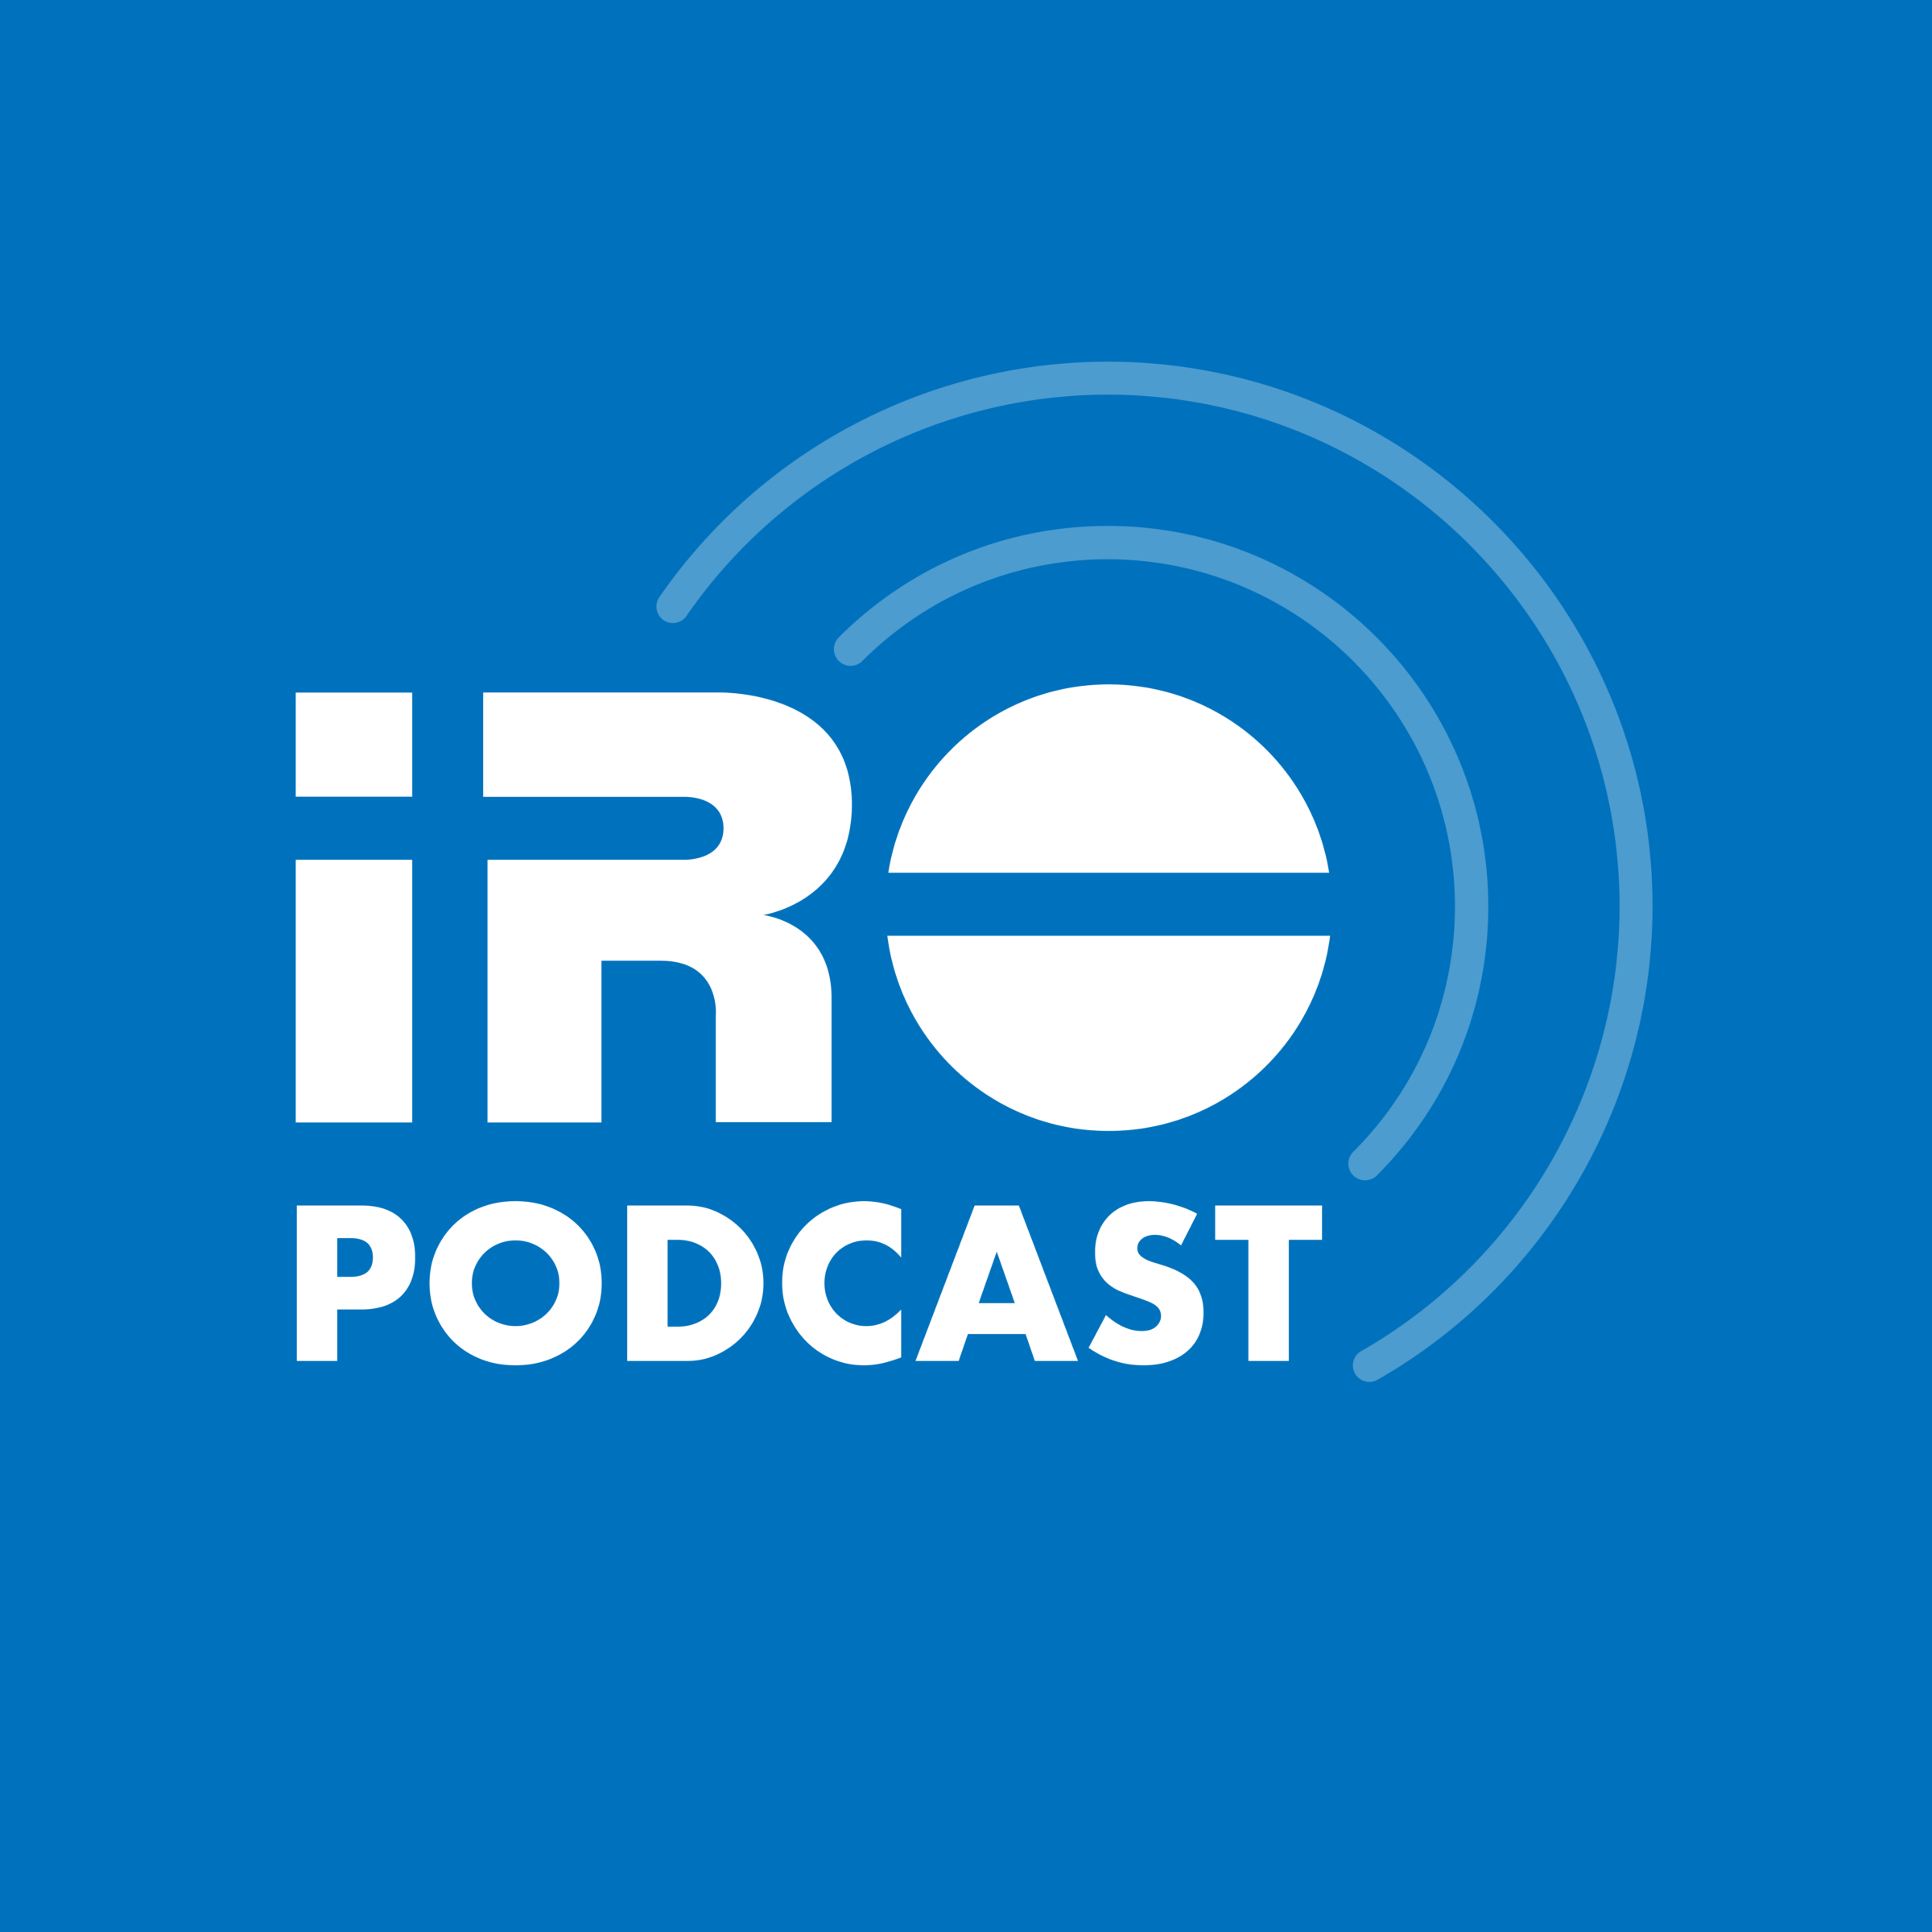 IRO Podcast